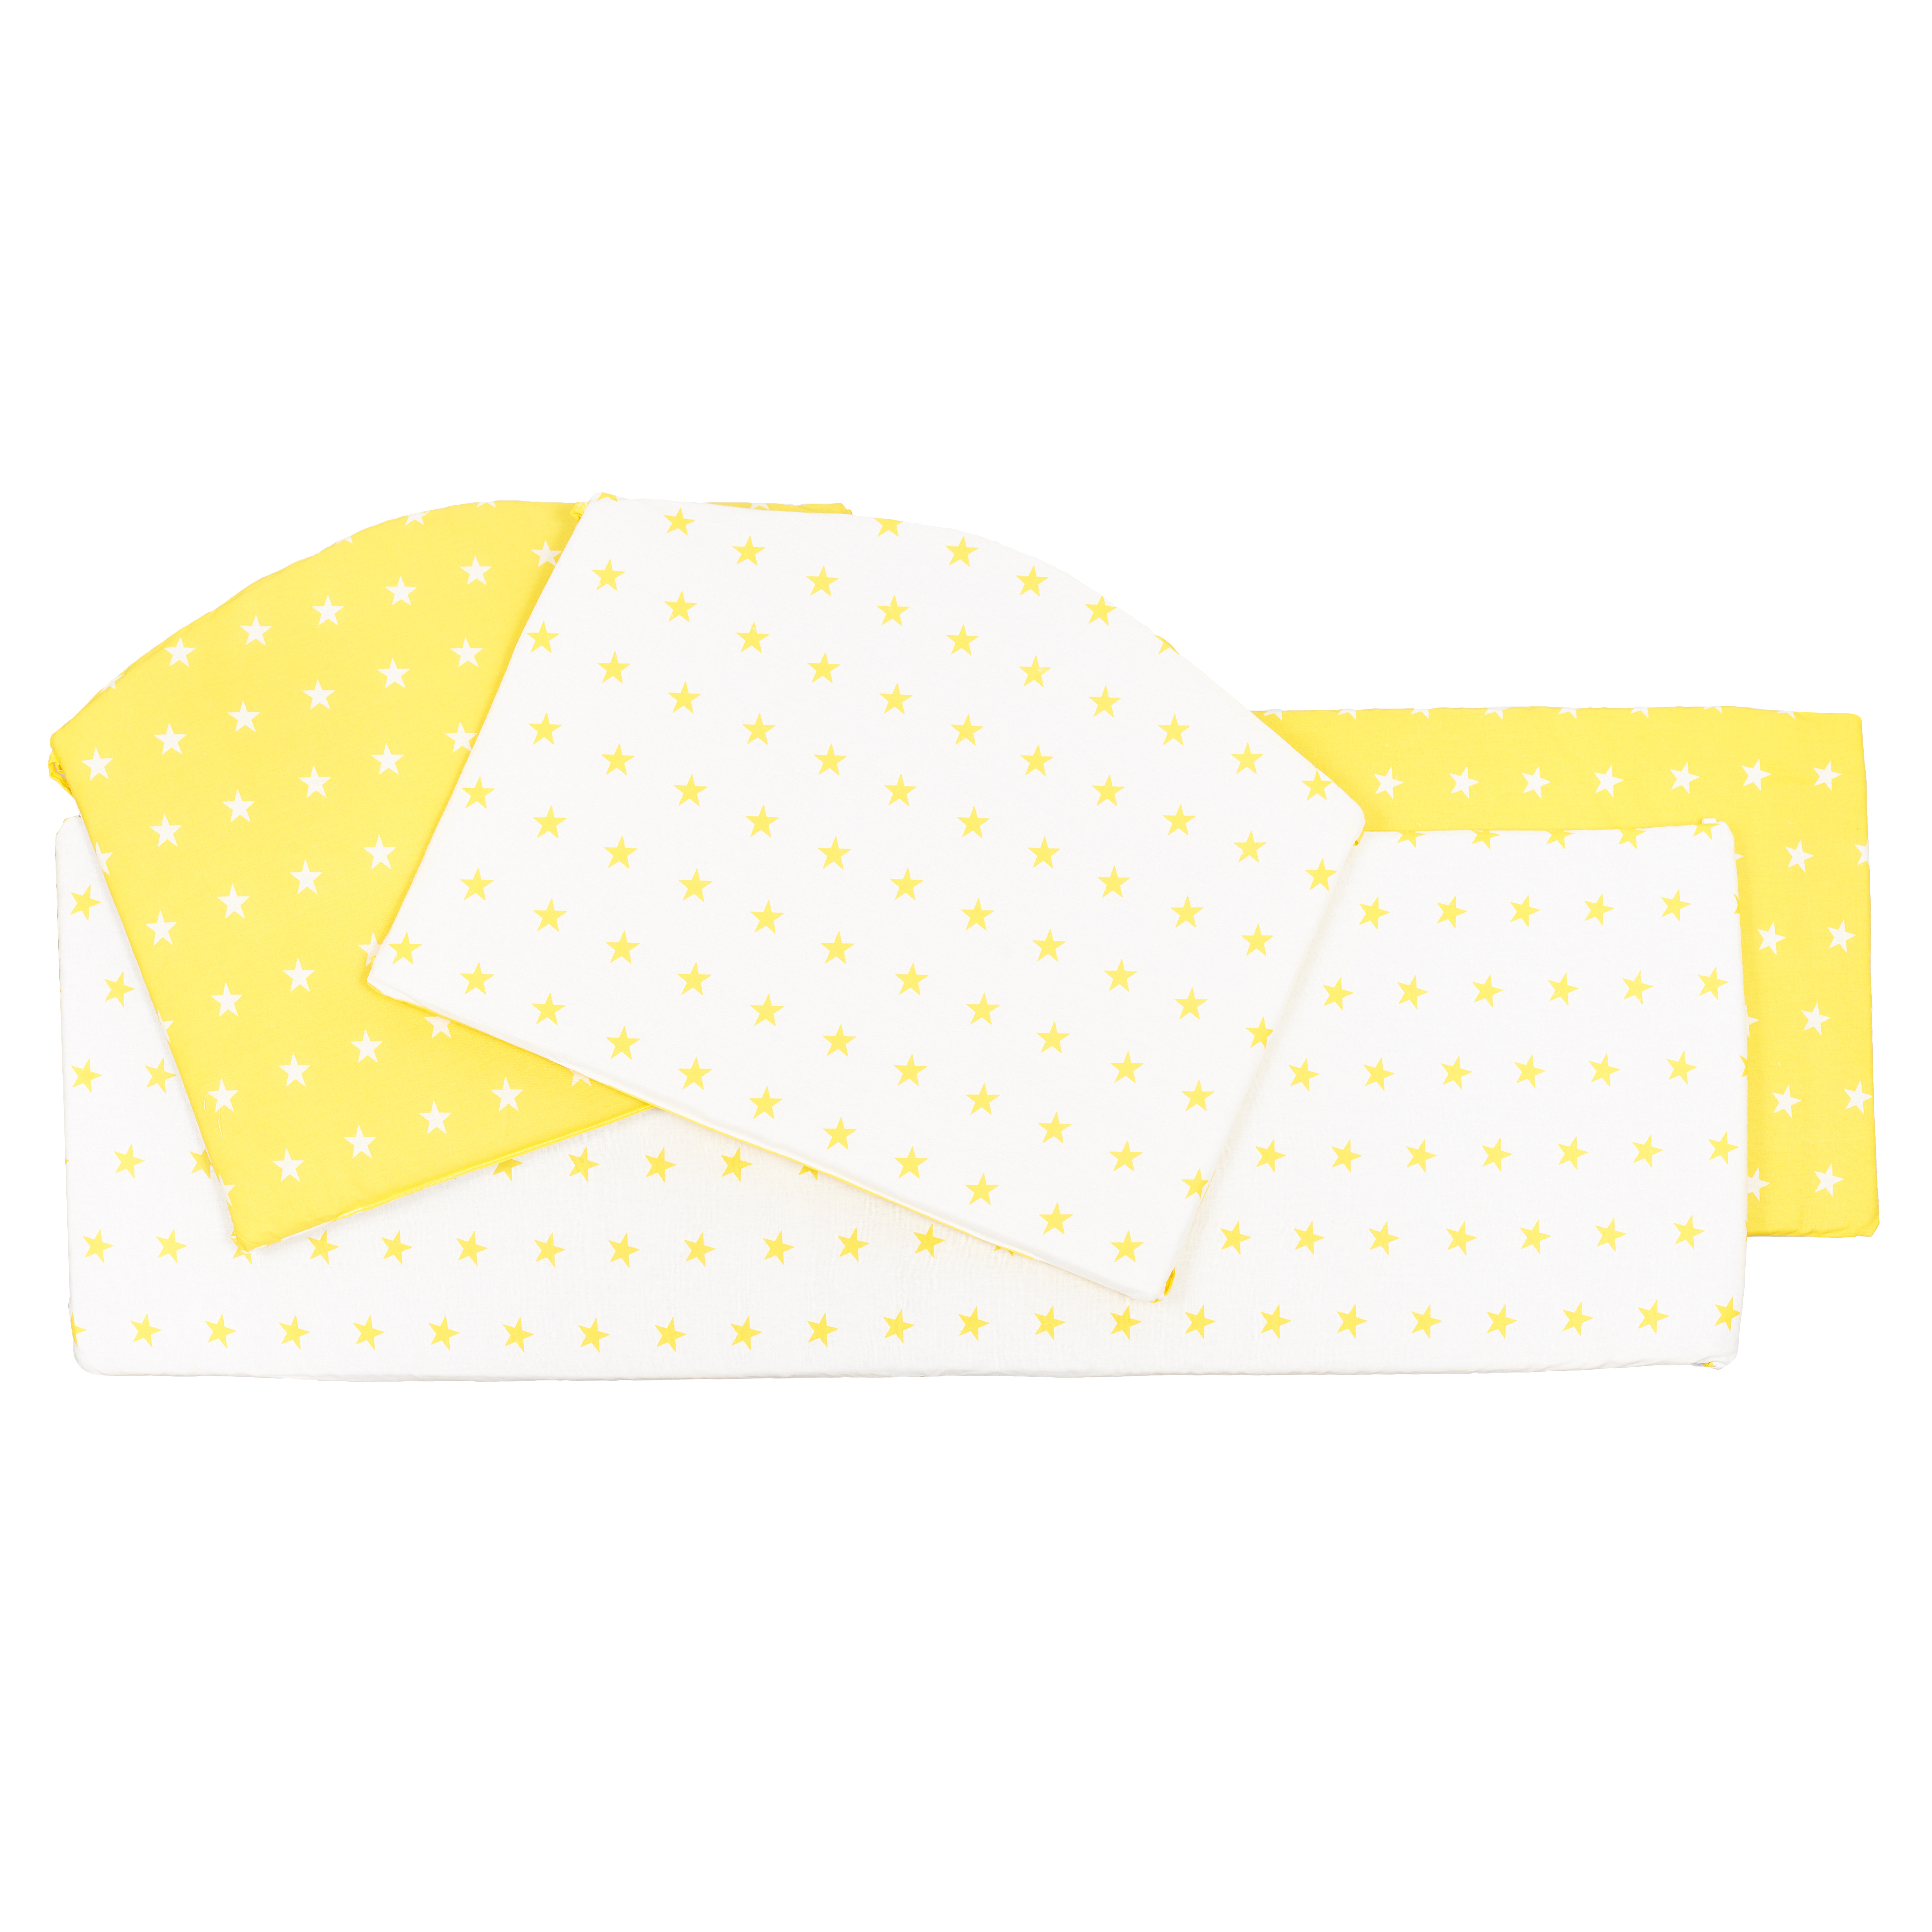 все цены на Постельные принадлежности Sweet Baby Бортики Sweet Baby «Stelle Giallo» 4 пр. желтые онлайн